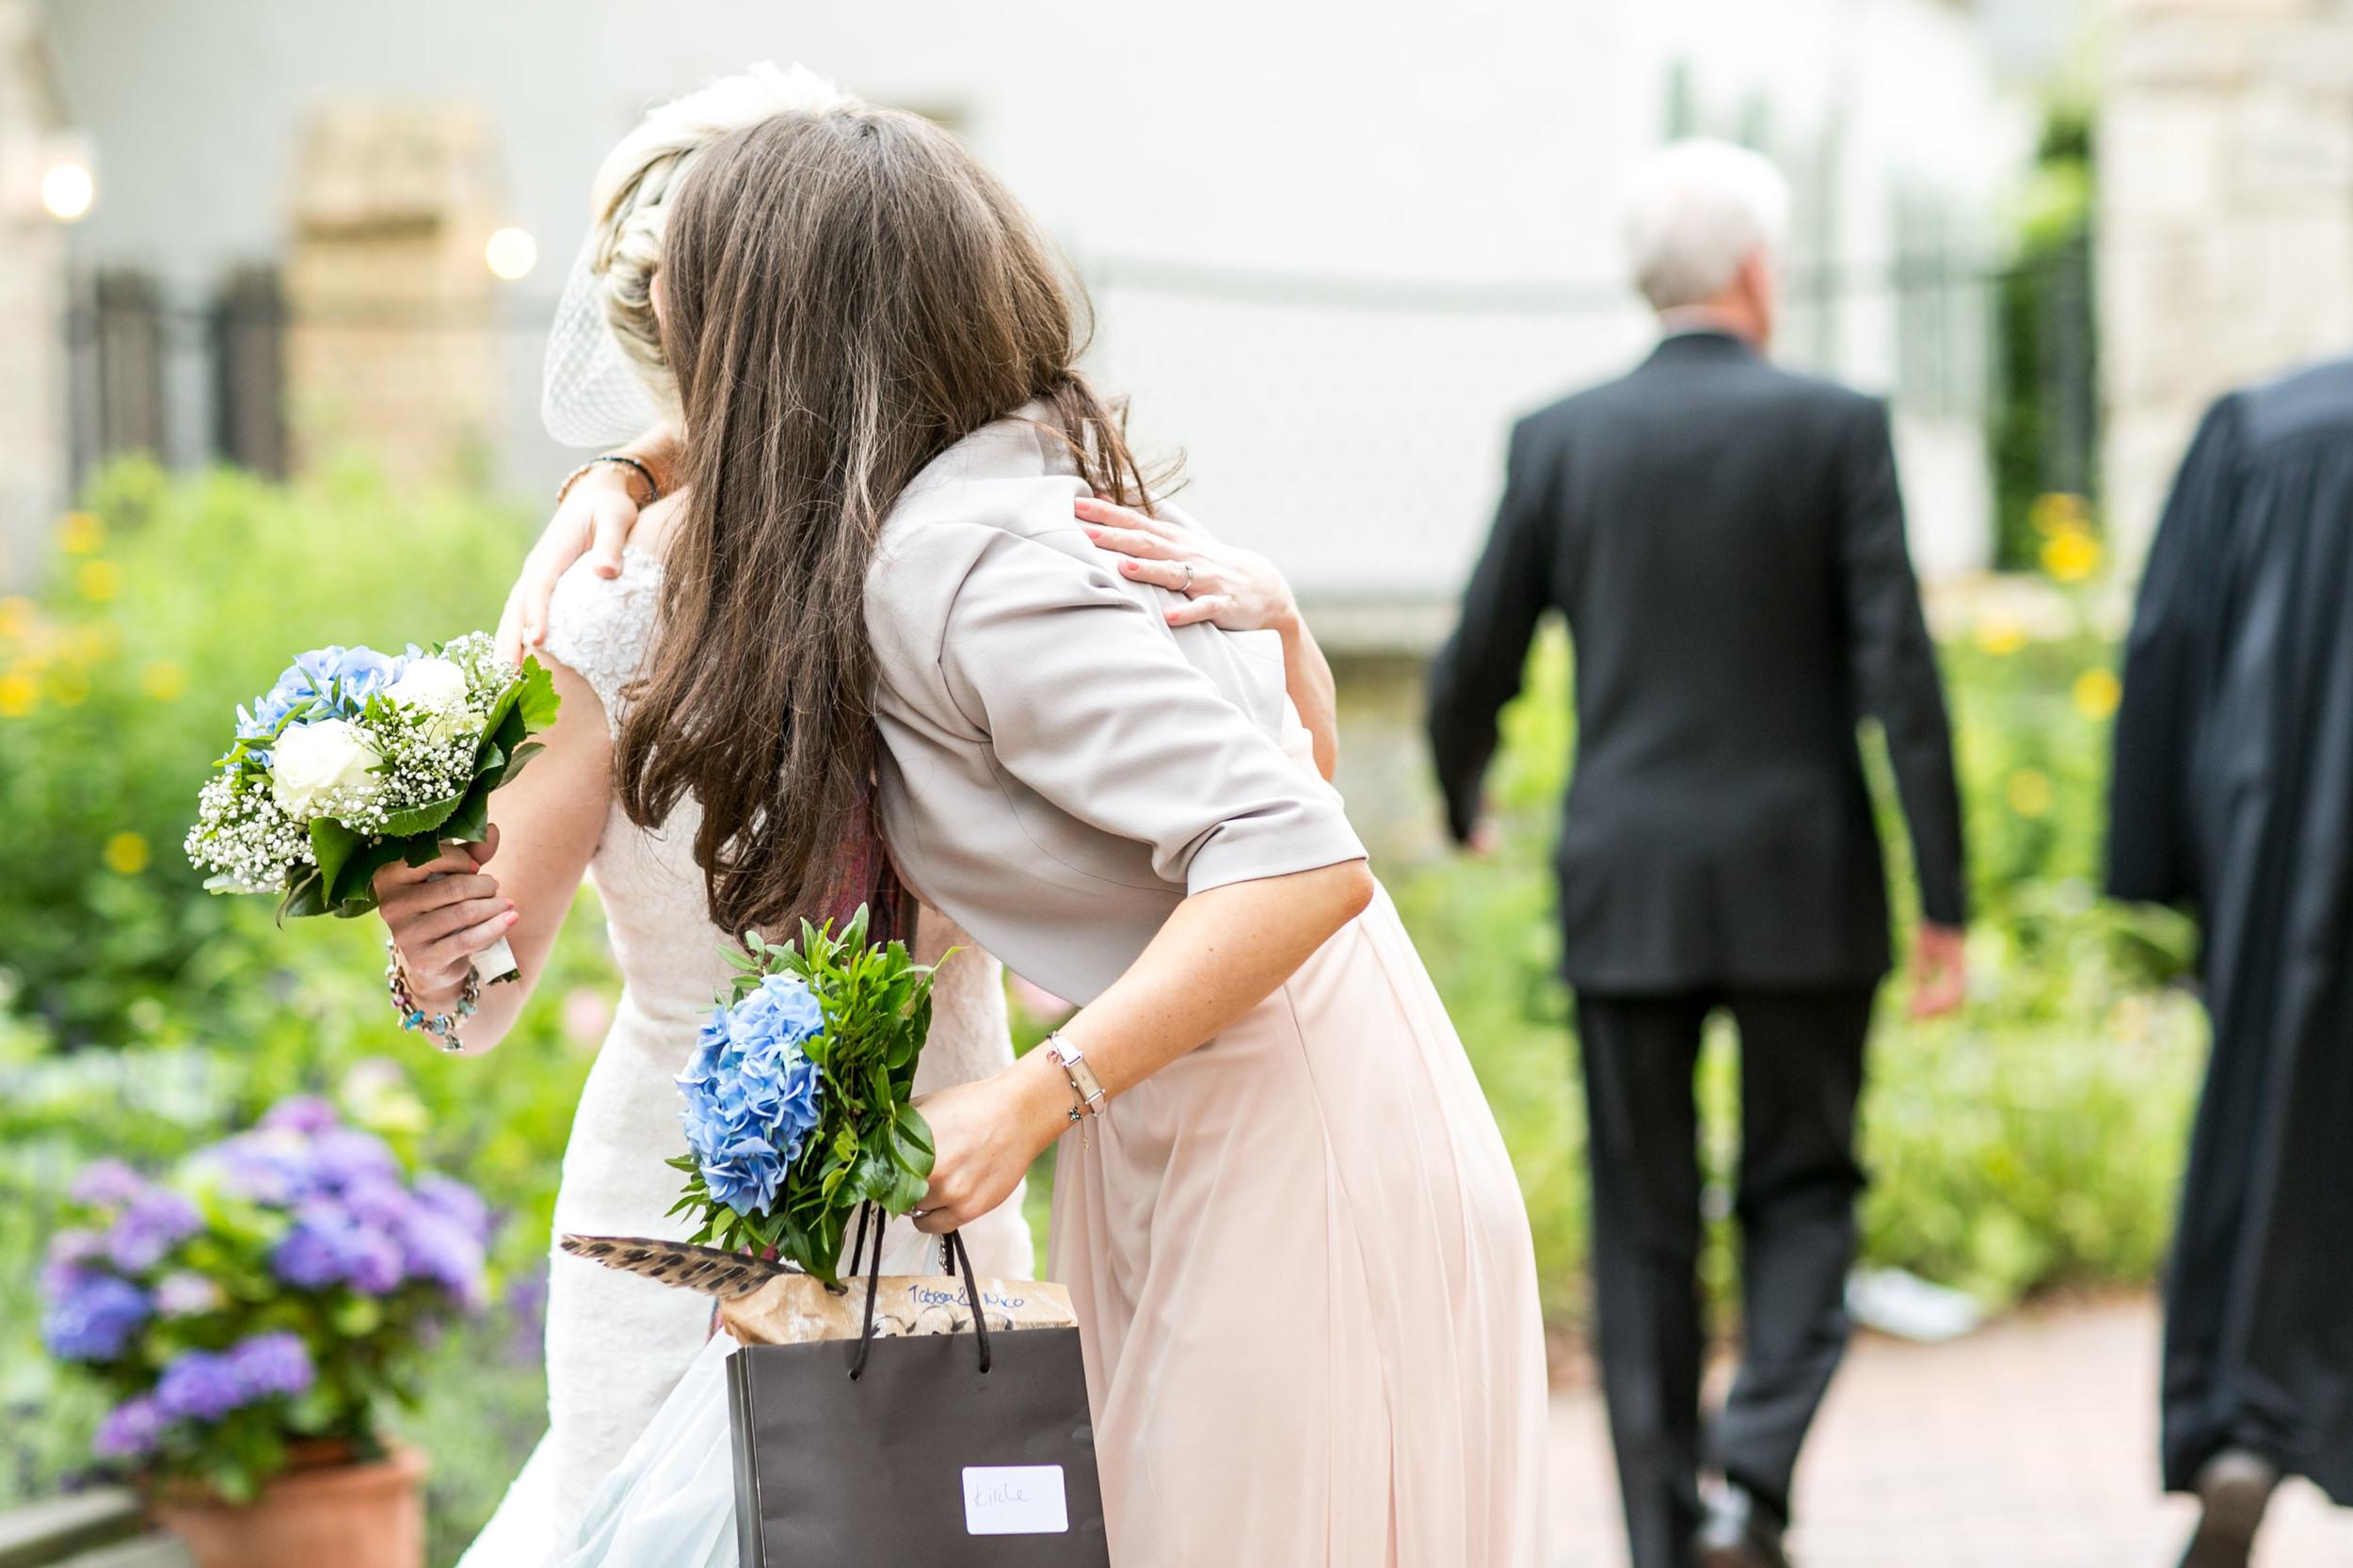 Hochzeitsfotografie Berlin_Fran Burrows Fotografie_7.jpg